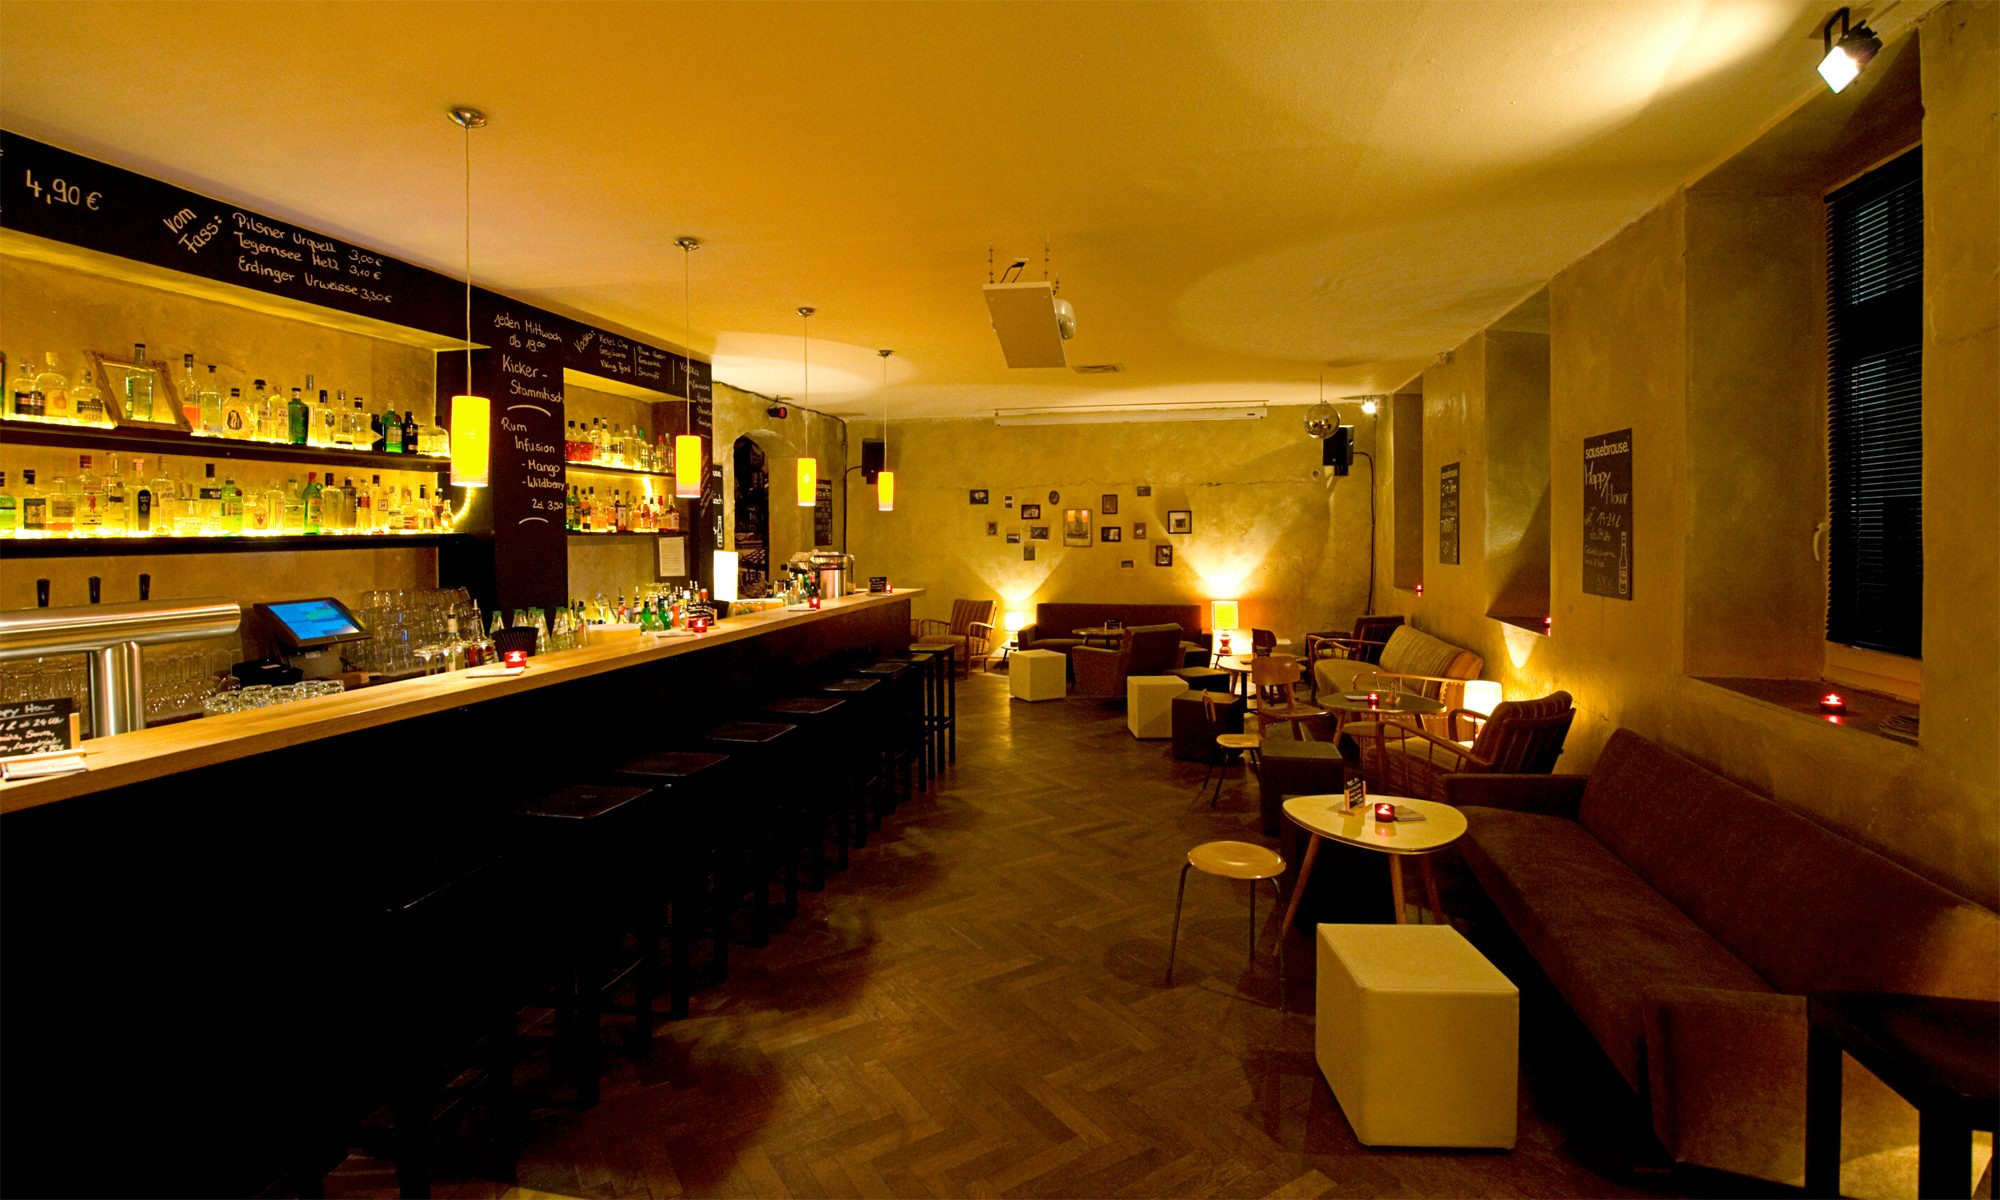 In the Couch Club Munich